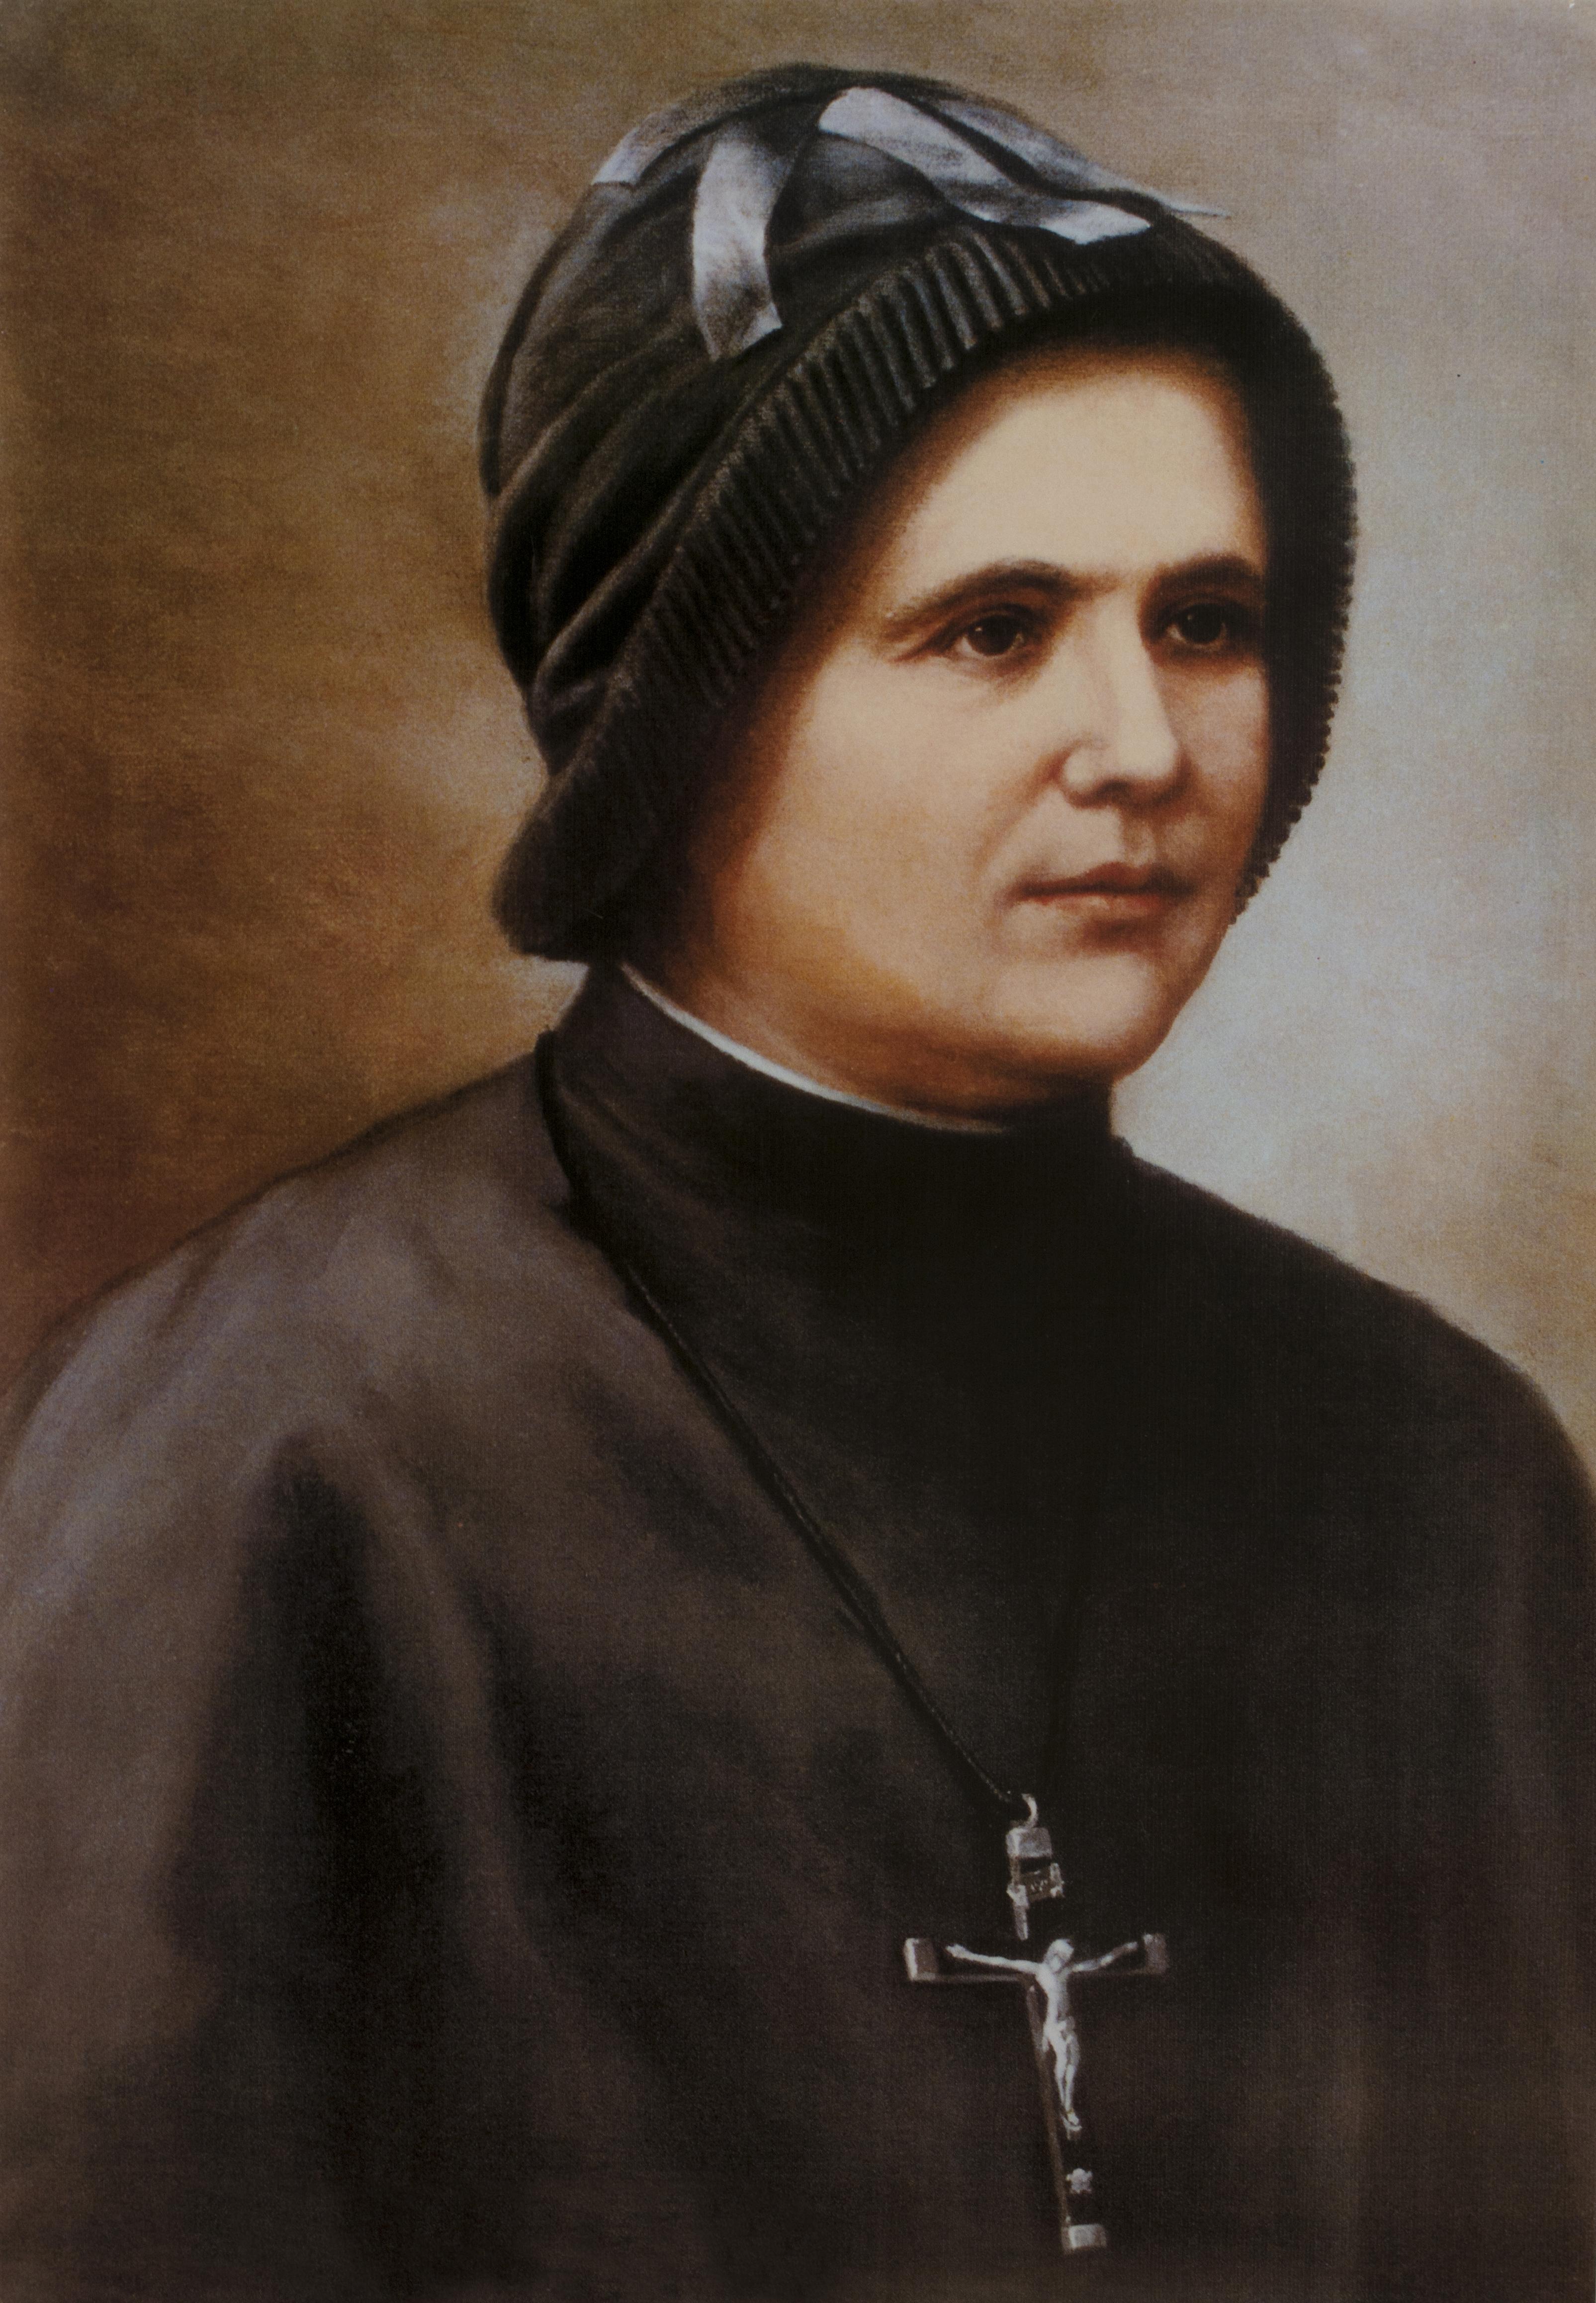 Papa aprova milagre de Madre Clélia